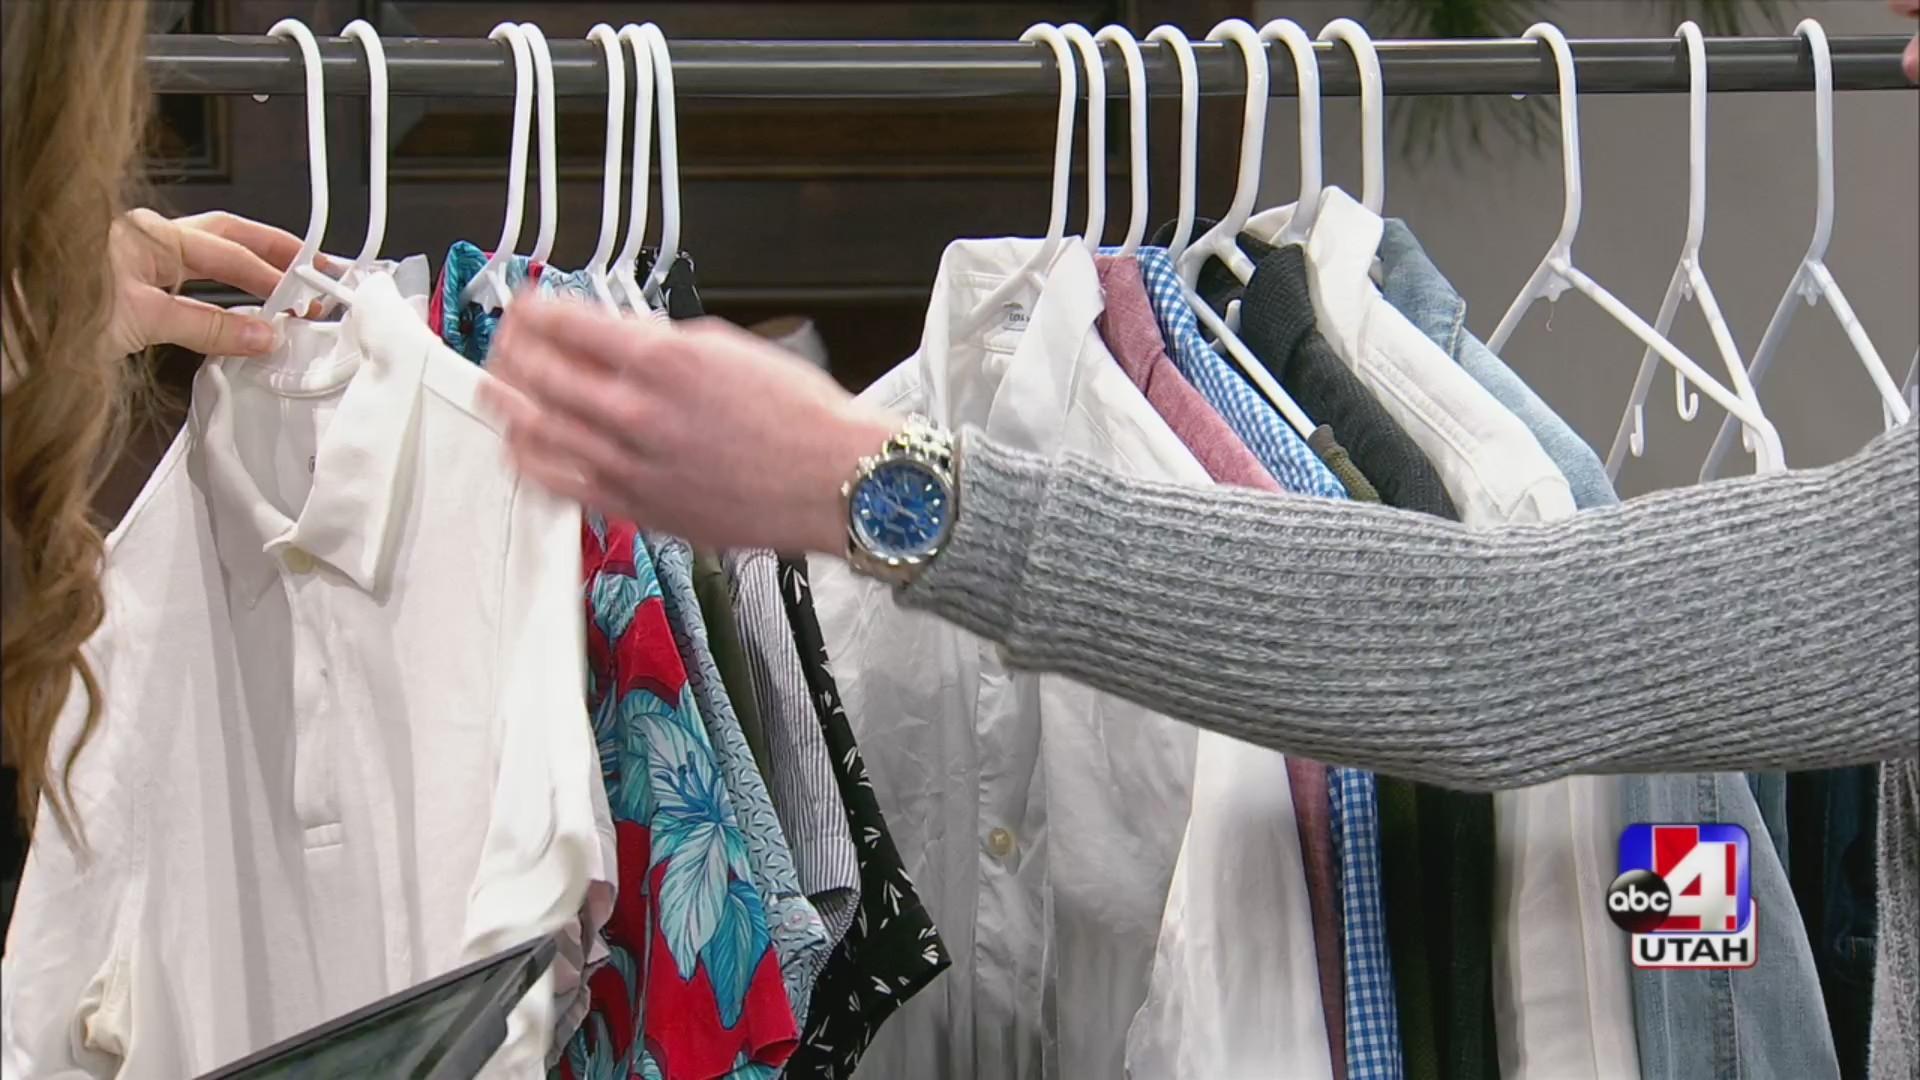 Organize Closet